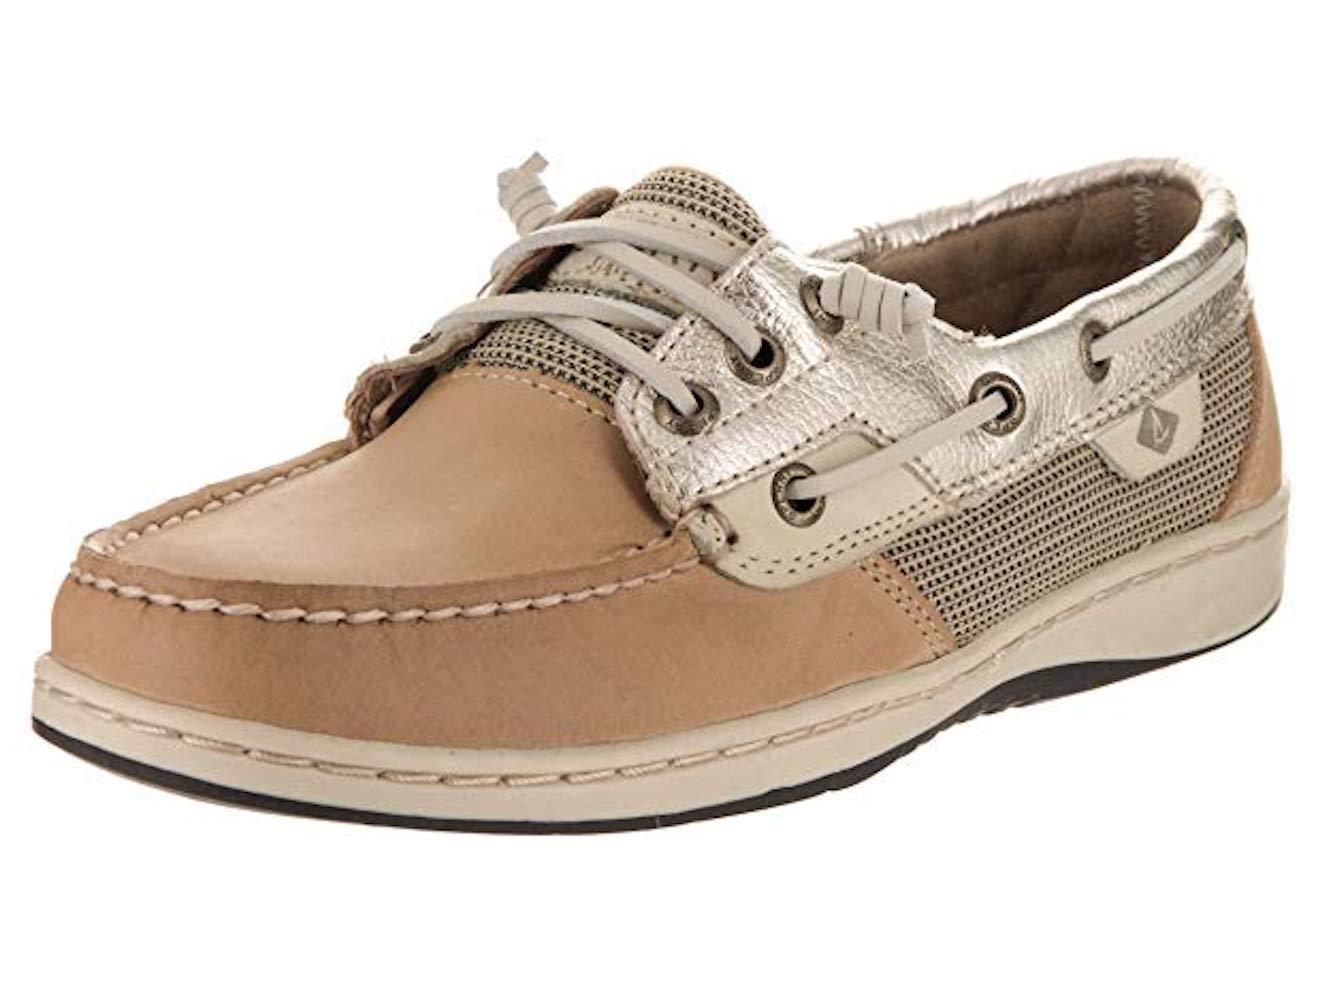 Sperry Top-Sider Women's Rosefish Linen/Platinum Boat Shoe 5M